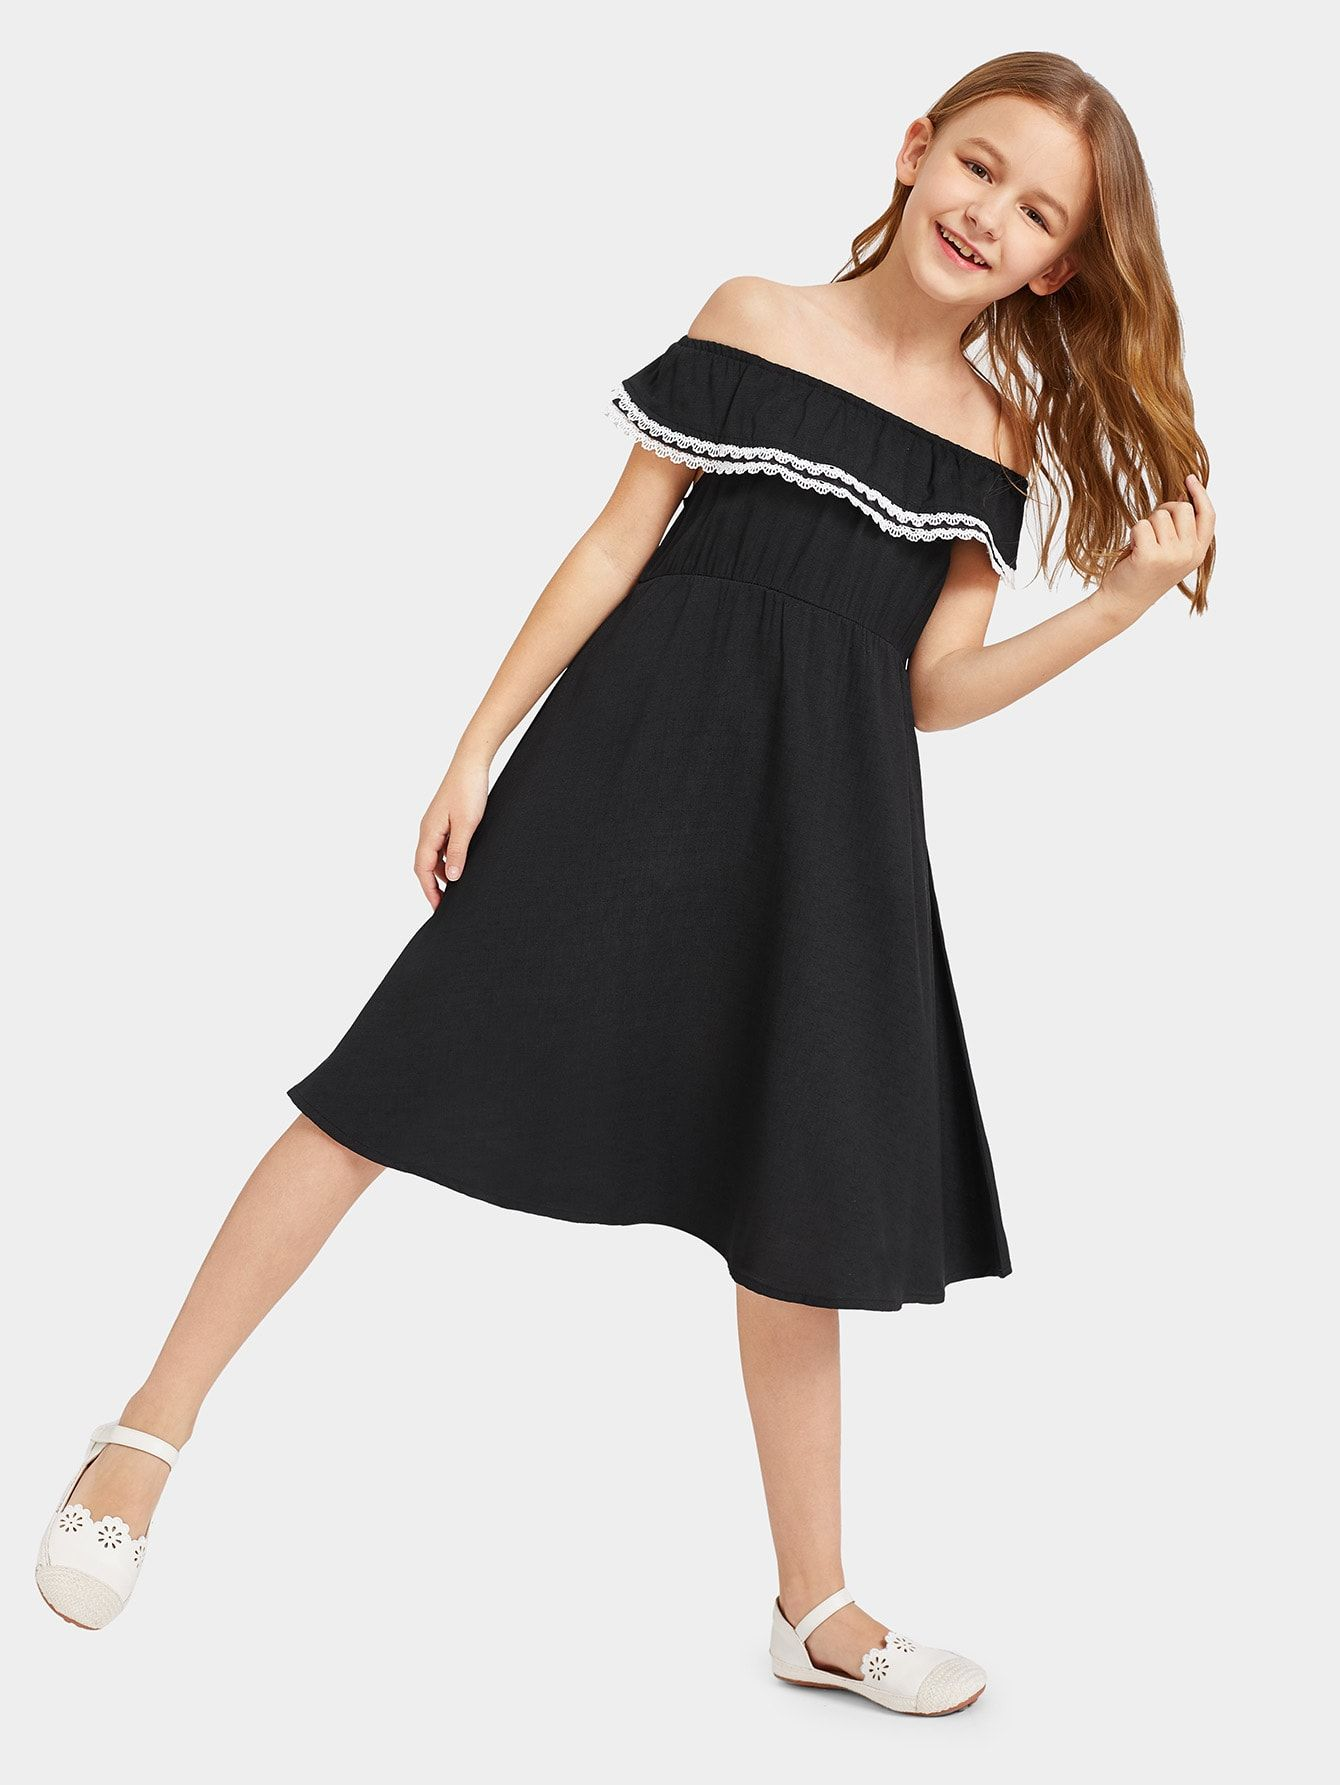 Girls Lace Trim Ruffle Off Shoulder Dress #Sponsored , #Ad, #Trim